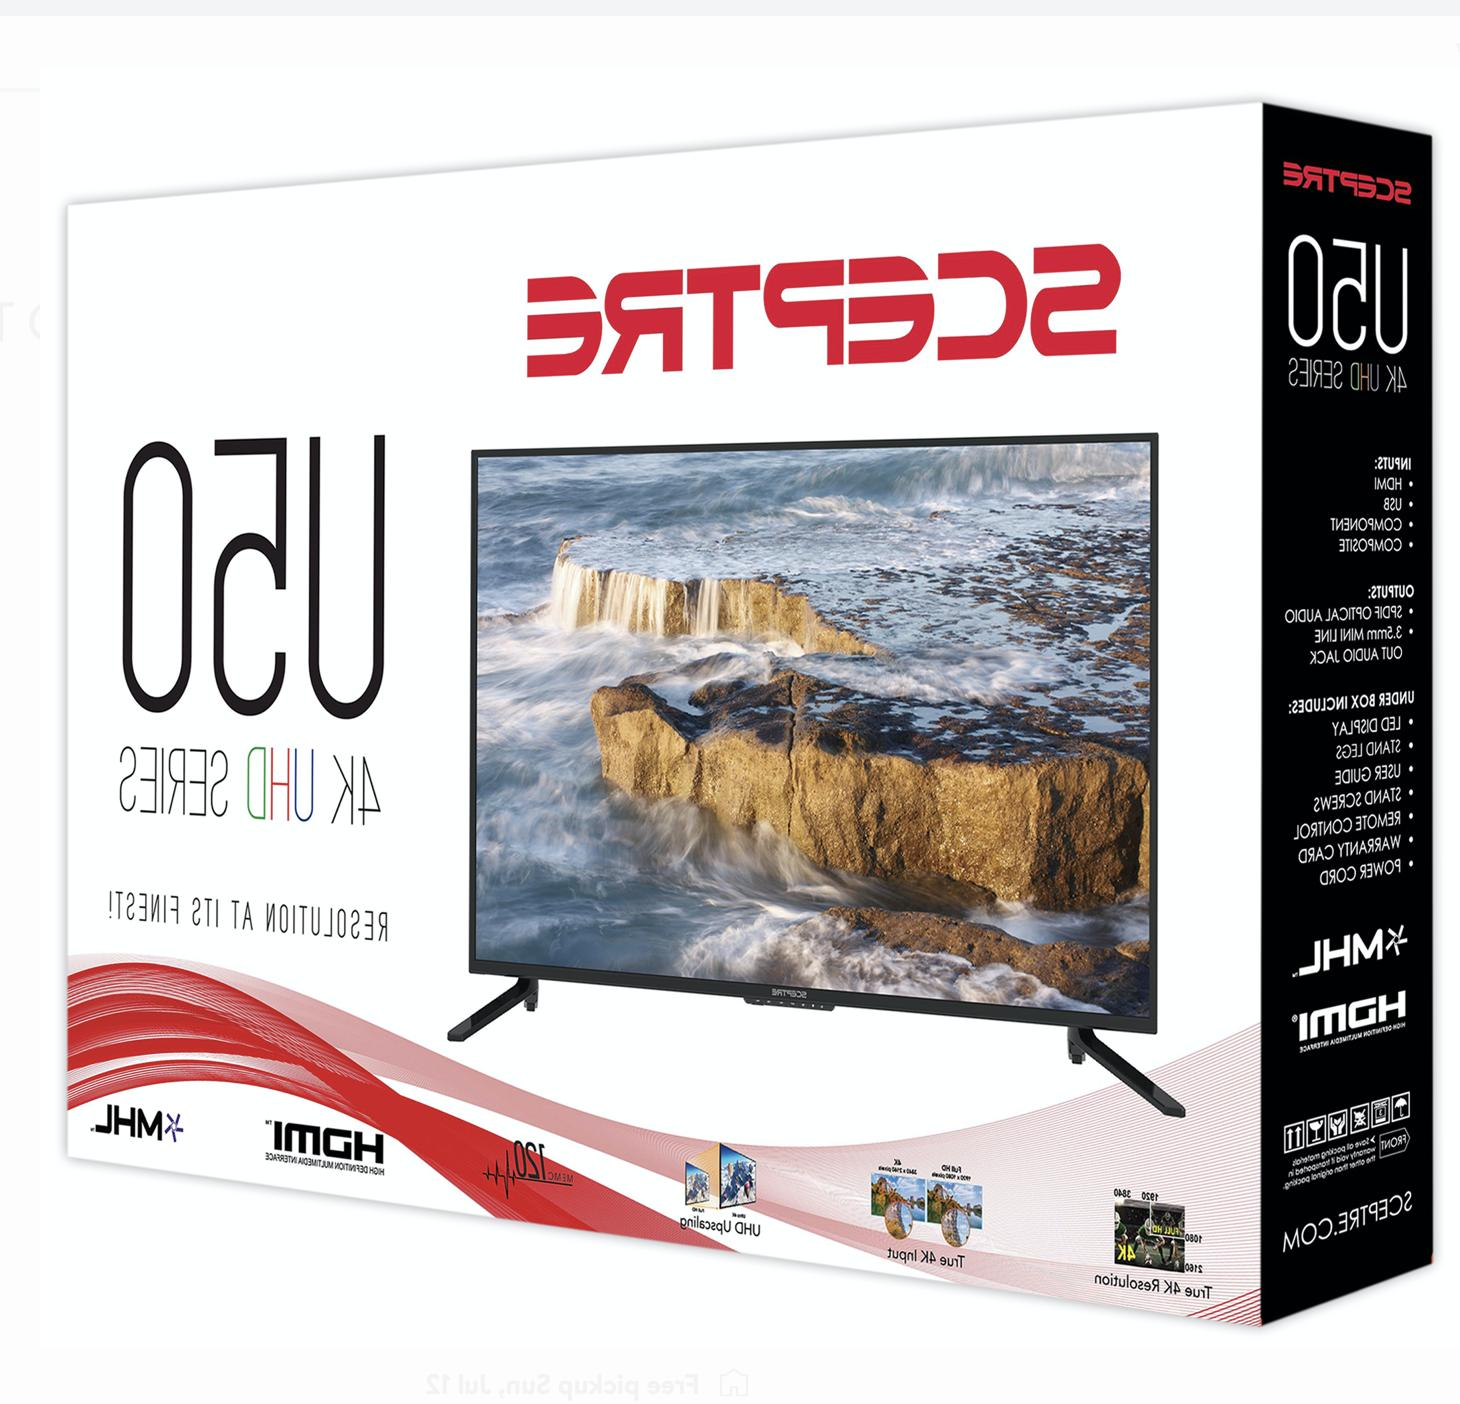 Sceptre 50inch UHD TV